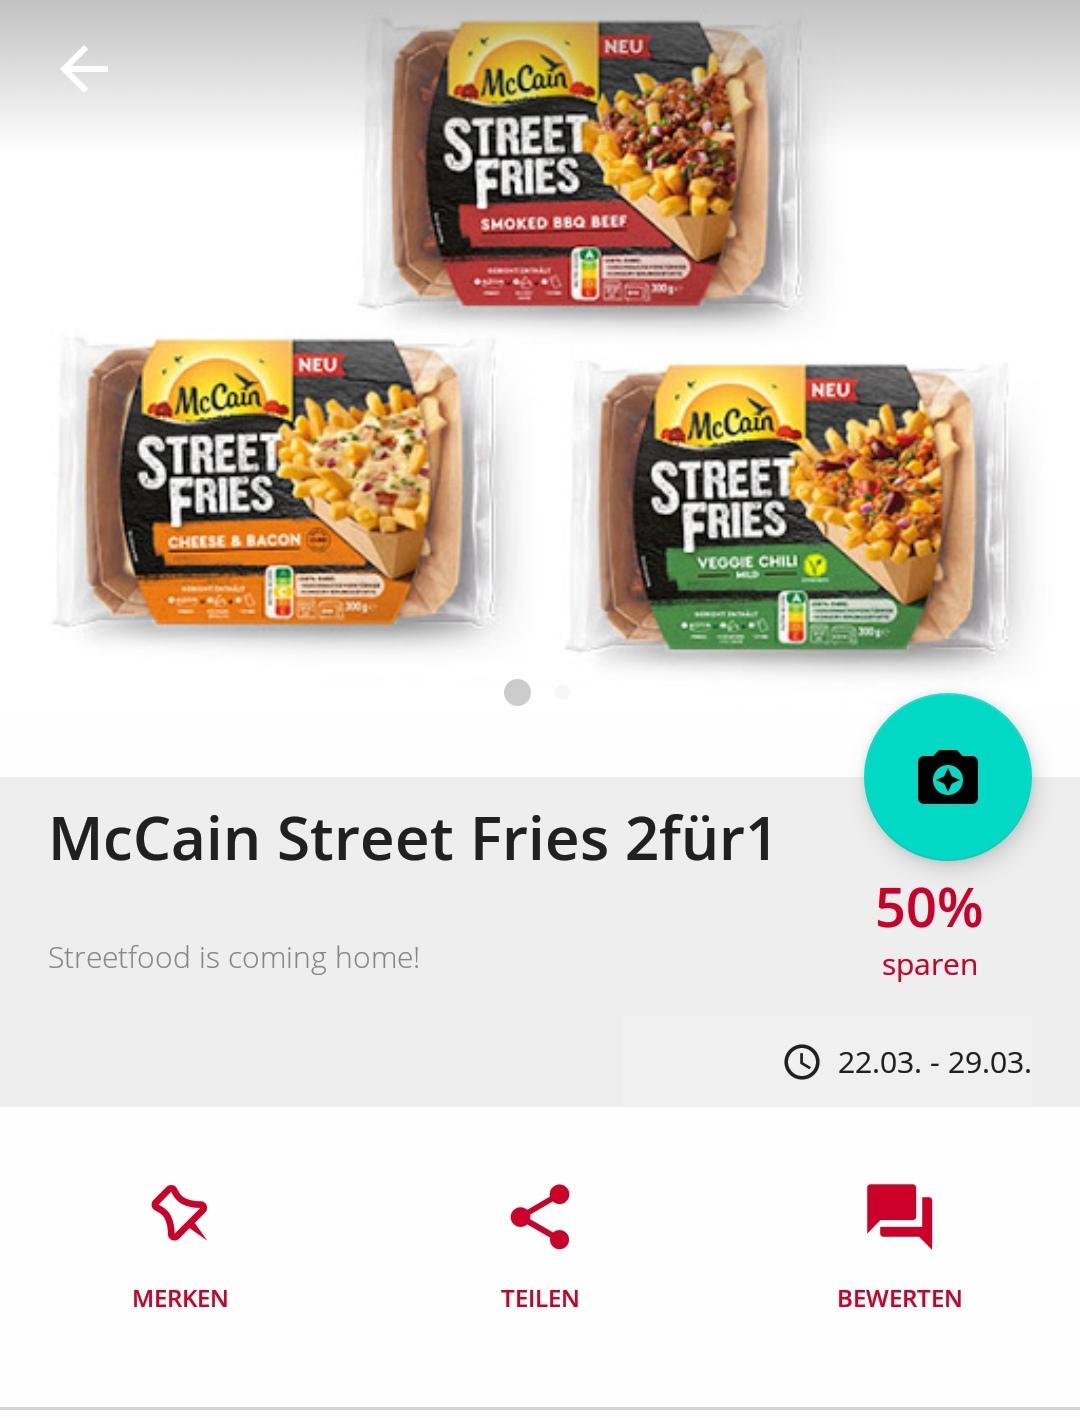 McCain Street Fries 2für1 durch Cashback [Scondoo] [Kochbar]